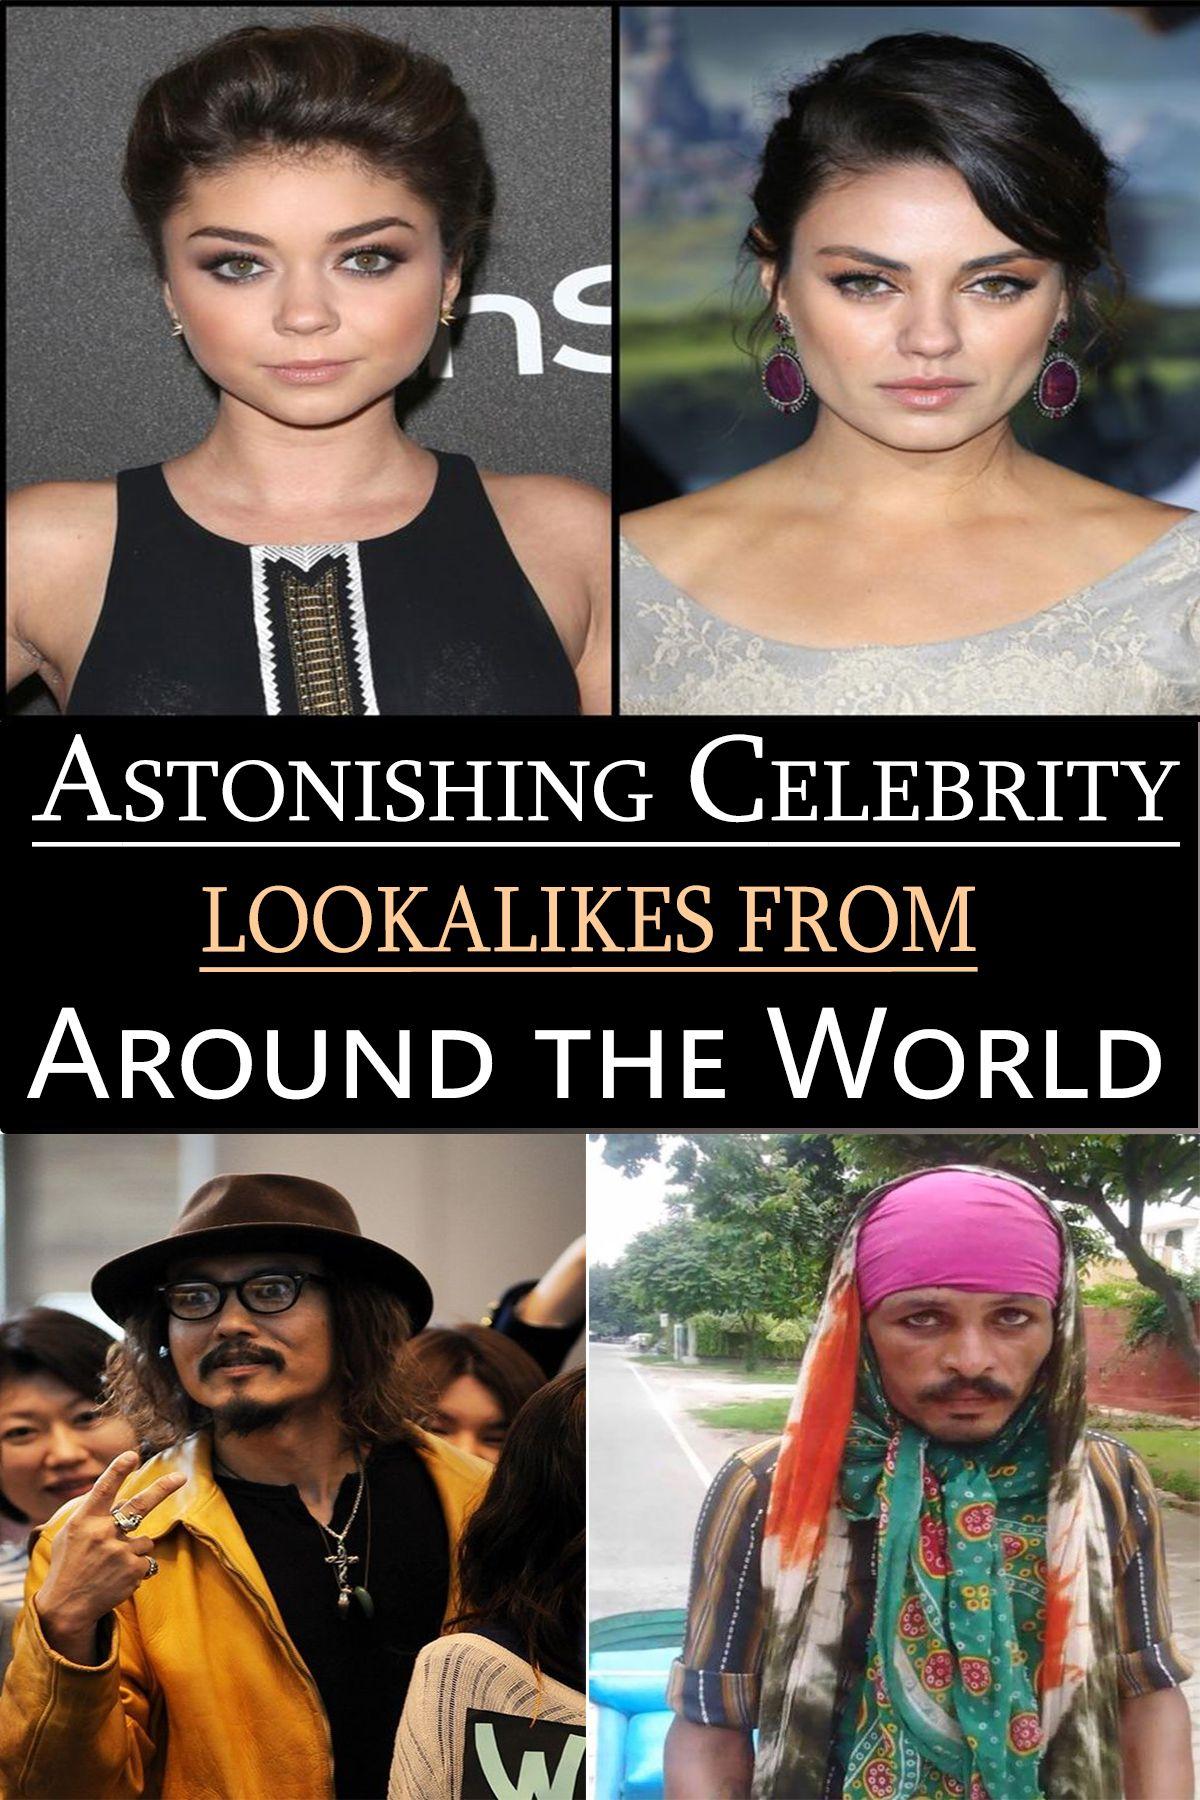 Astonishing Celebrity Lookalikes From Around The World Celebrities Celebrities Funny Crazy People